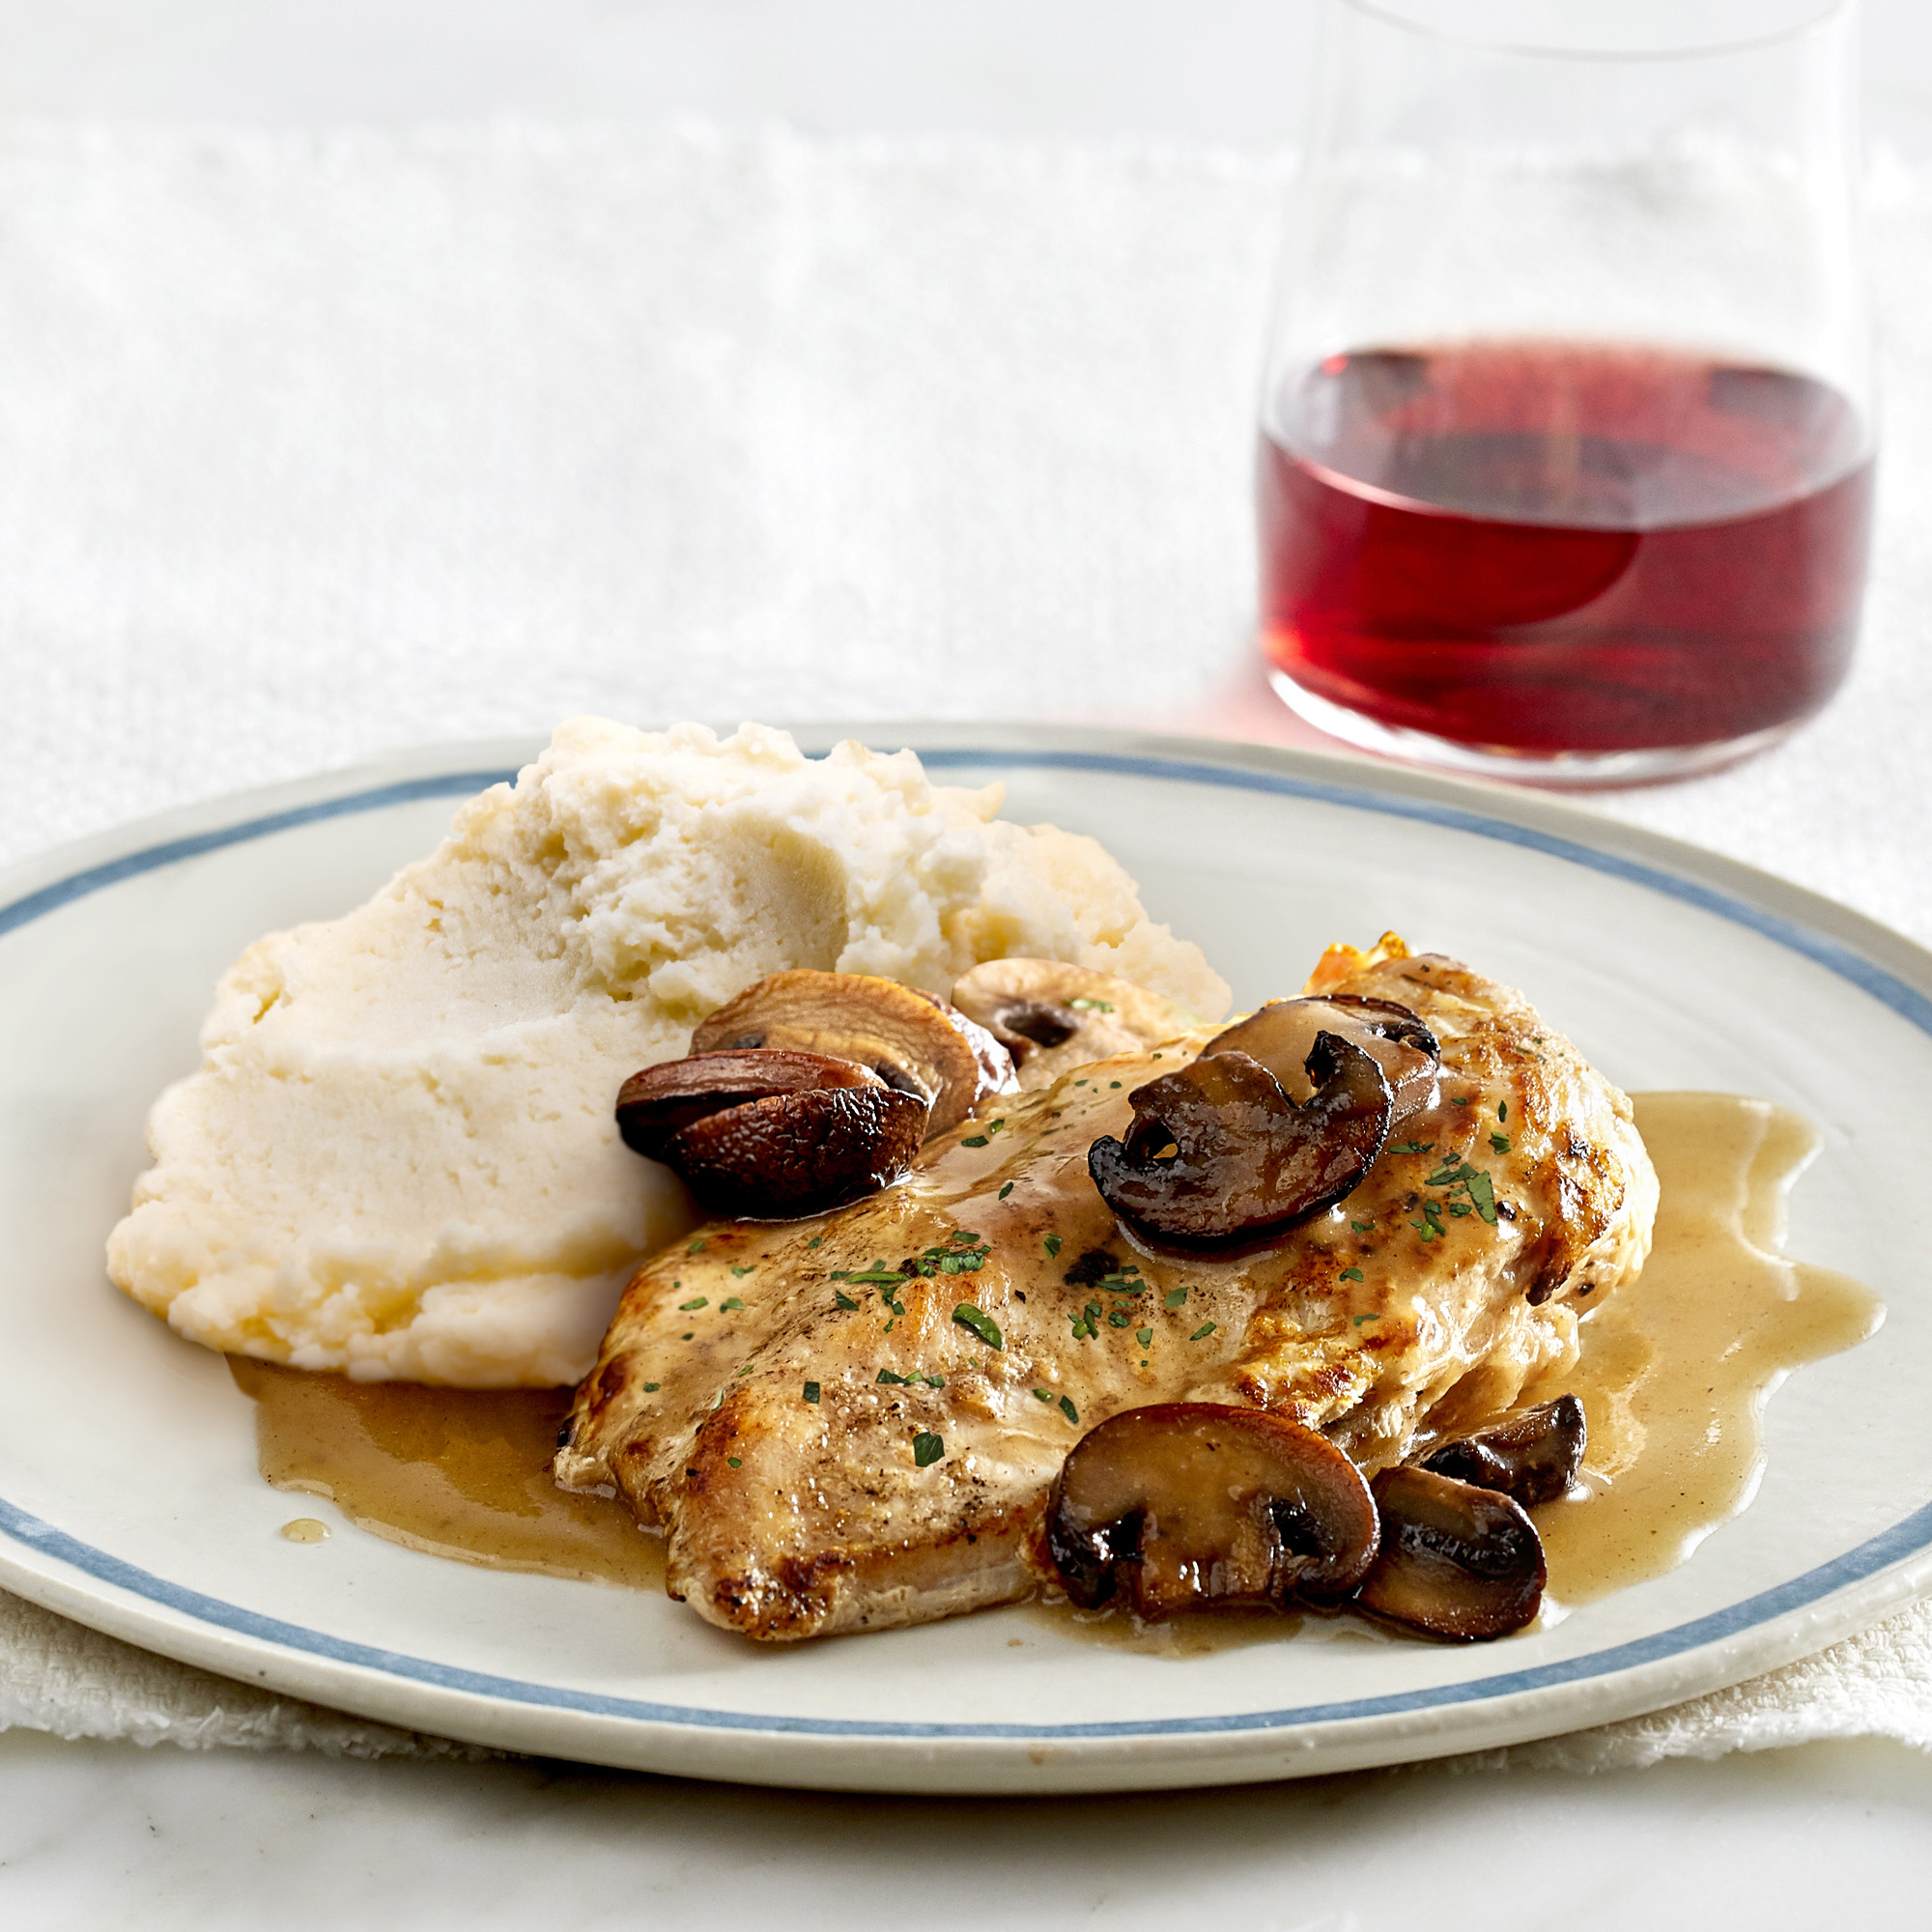 Babeth's Feast - 6 Meals - Chicken Marsala & Simple Potato Puree - Heat & Serve- individually portioned